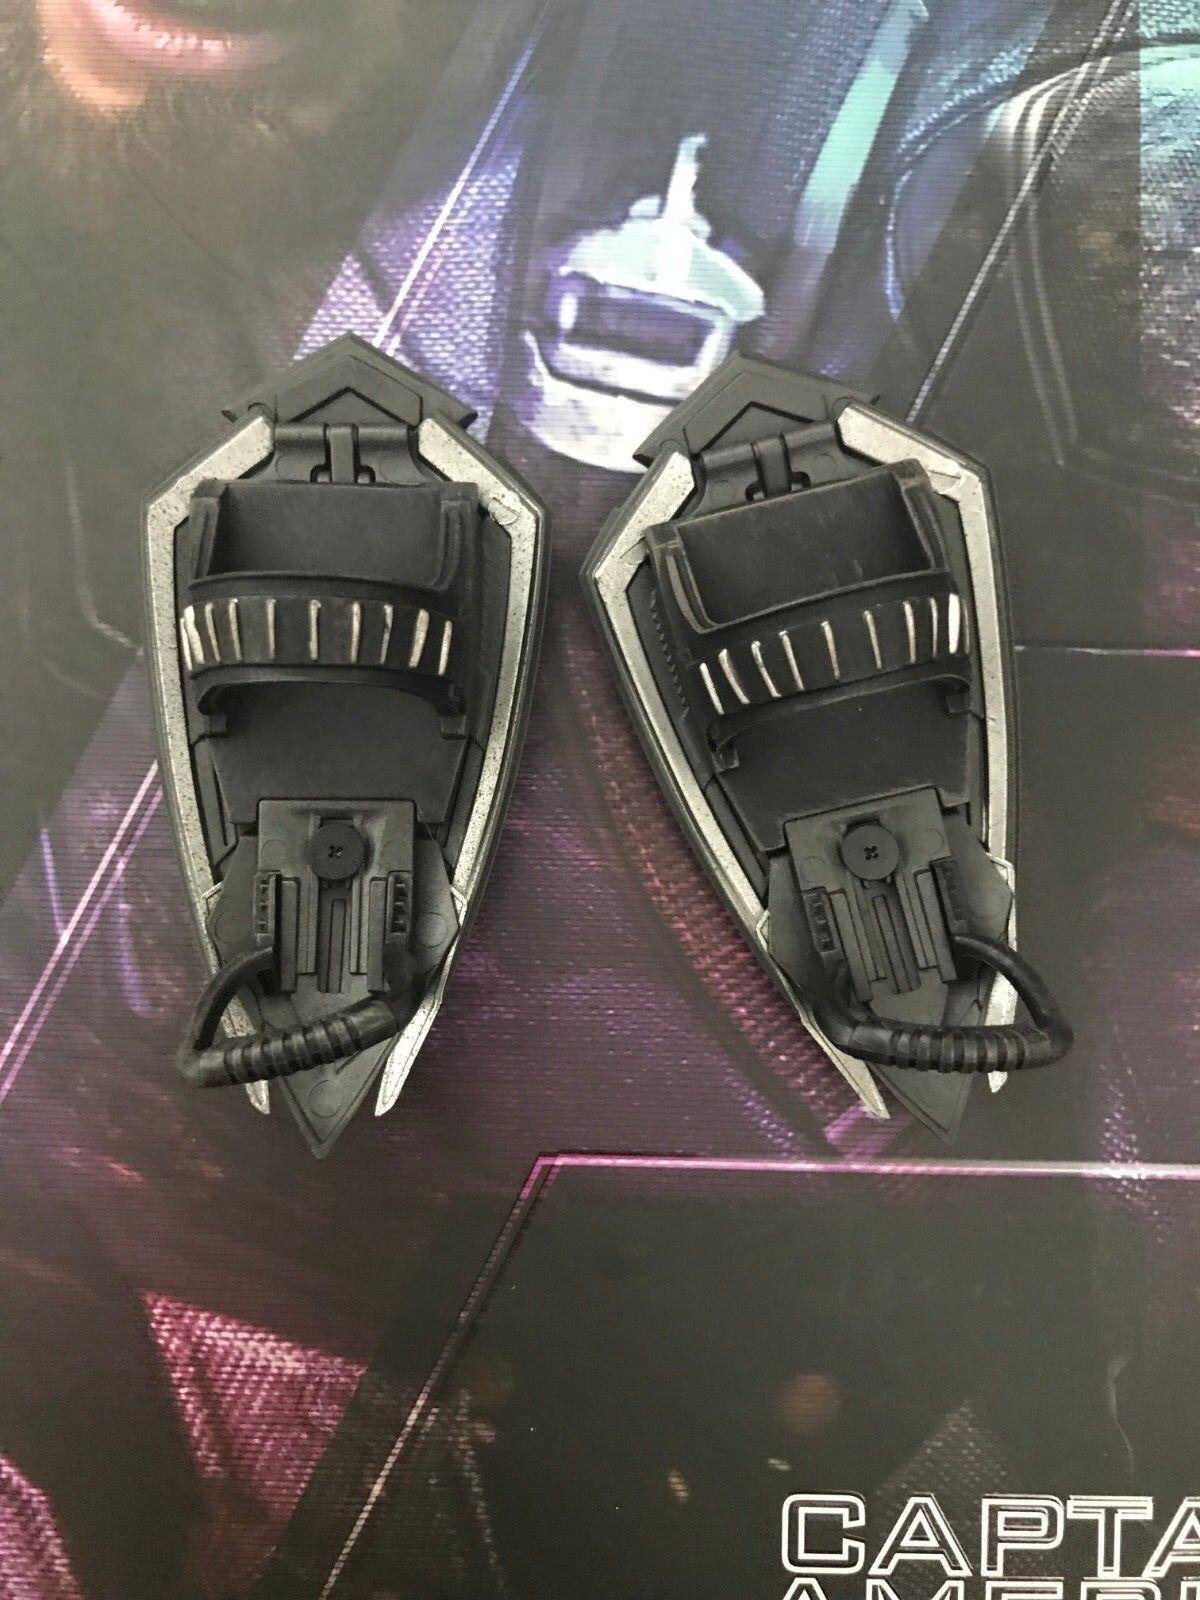 Hot toys  Captain America Infinity Wars MMS481 Movie Promo - Wakanda Shield  vente directe d'usine